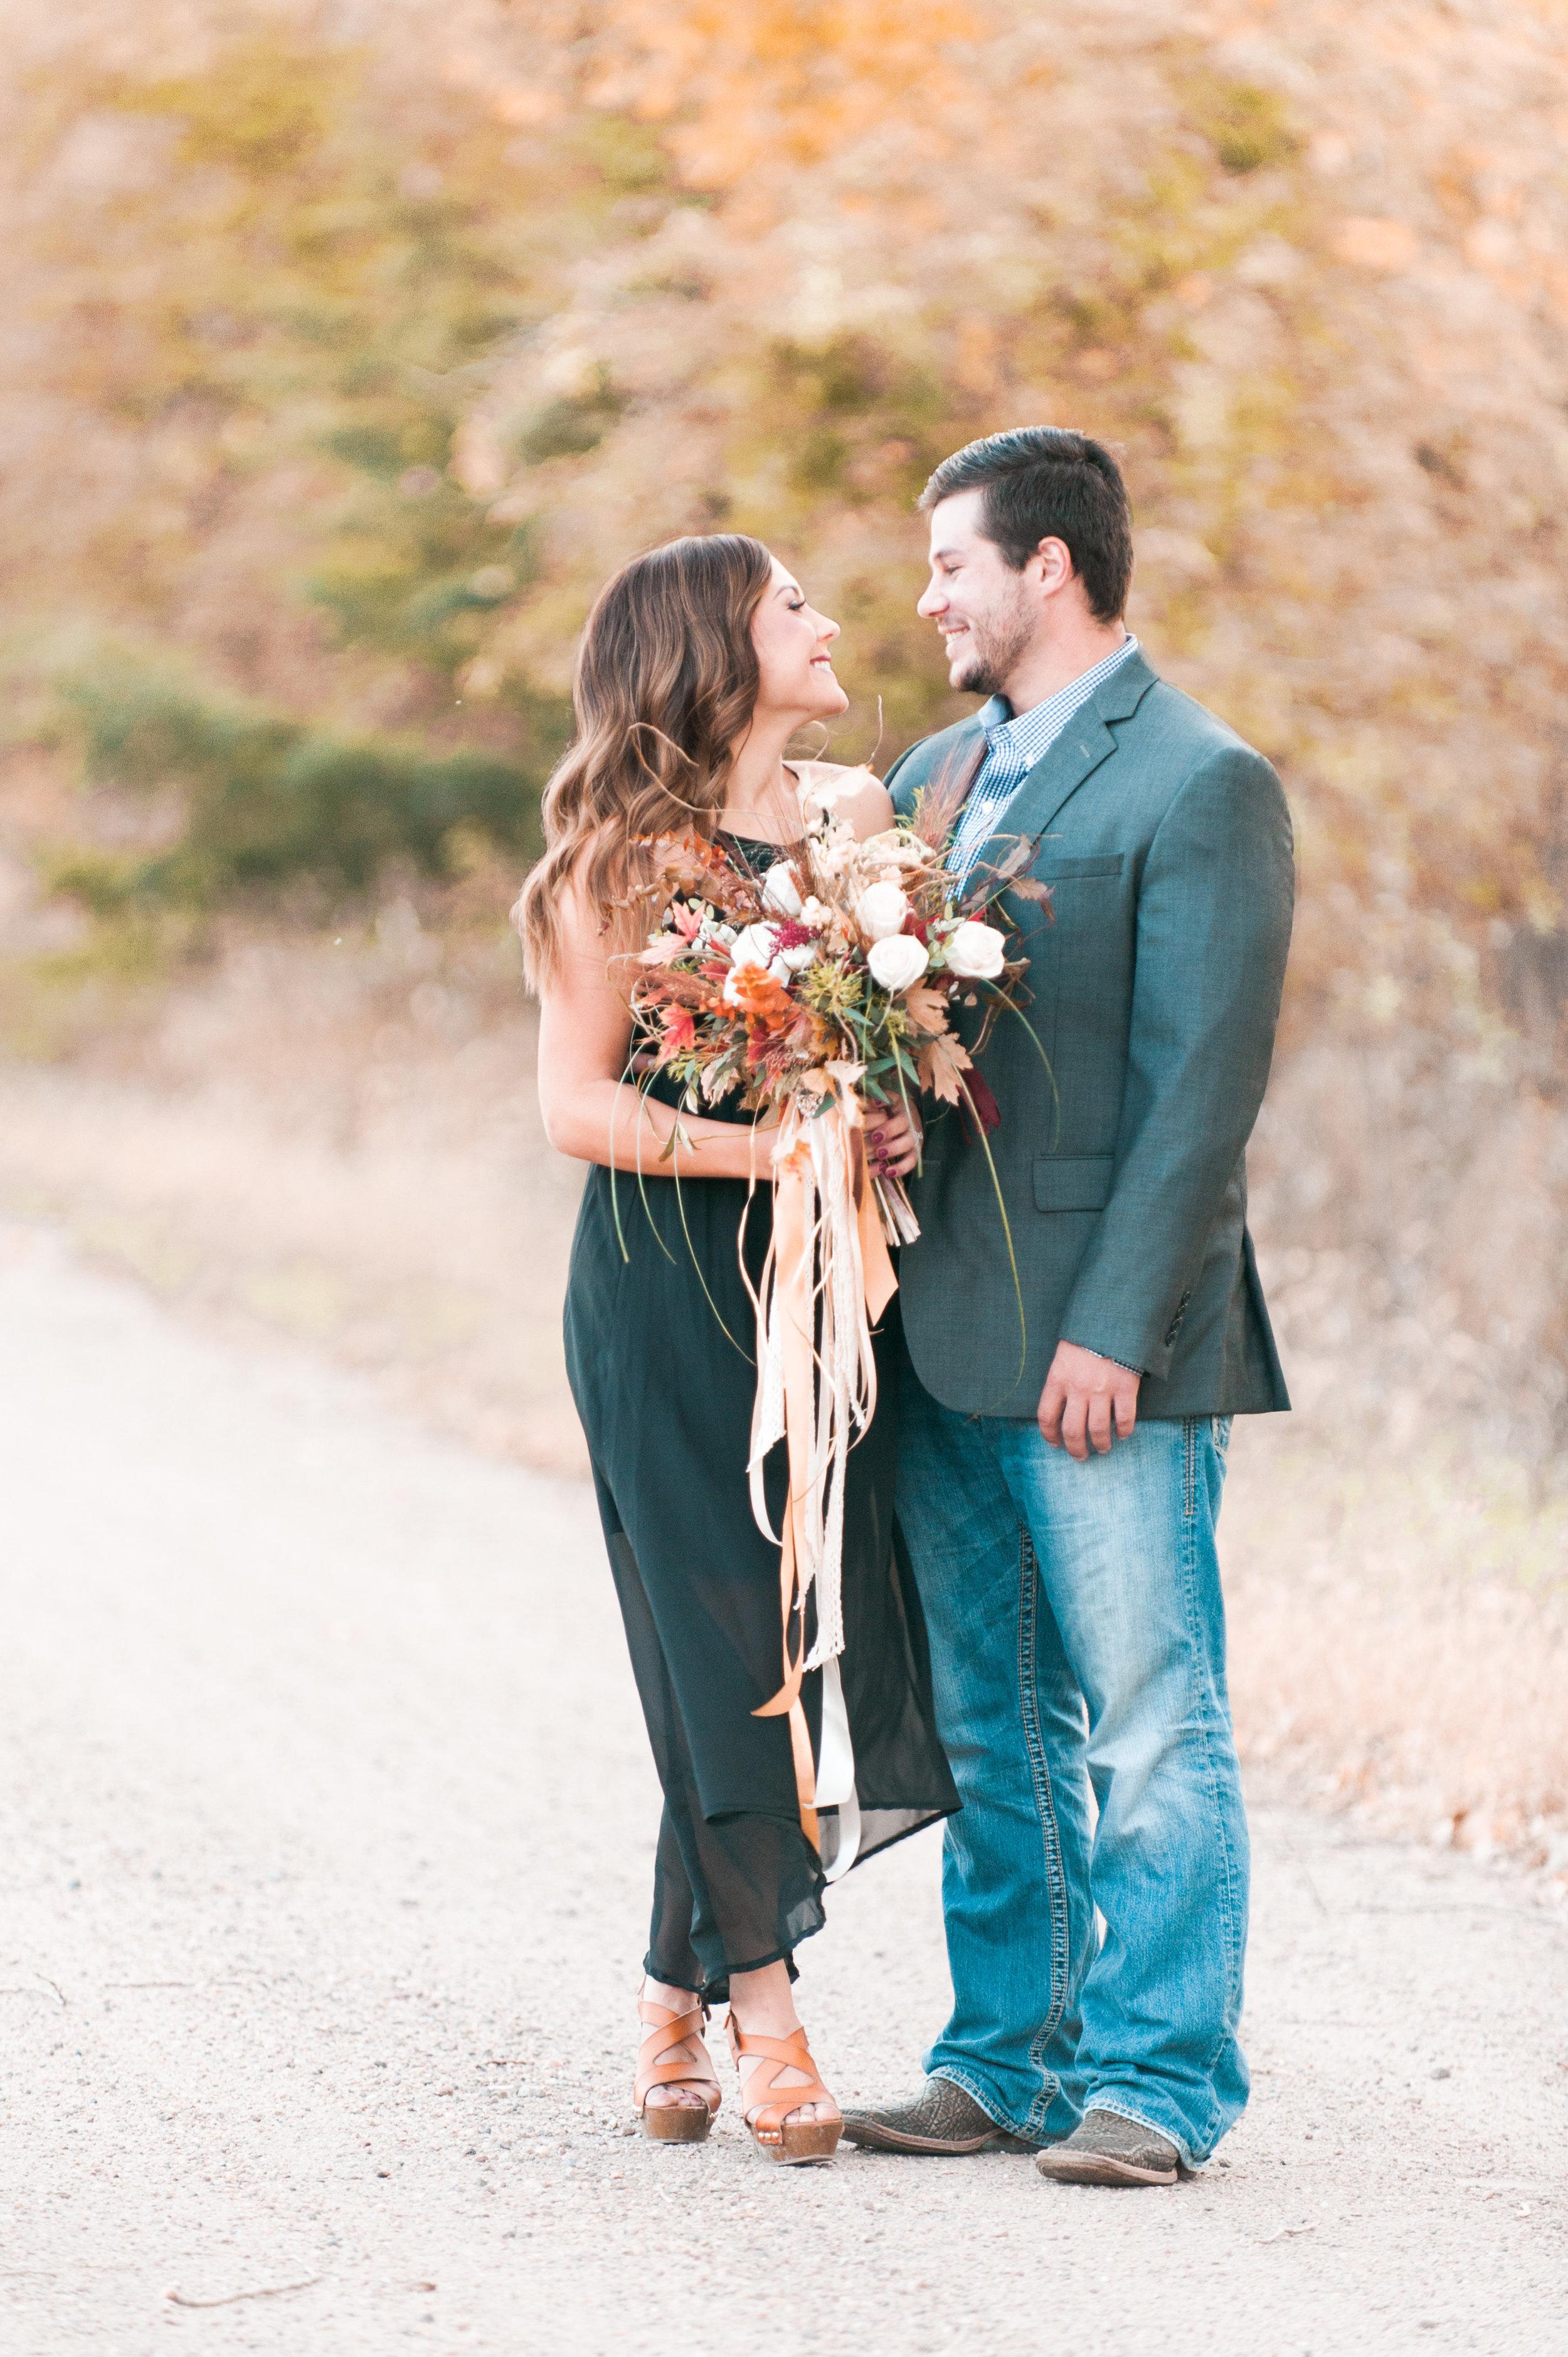 Kearney florist Diva's Floral Shop & Boutique. Photography by Kearney wedding photographer Samantha Weddings |  www.samanthaweddings.com